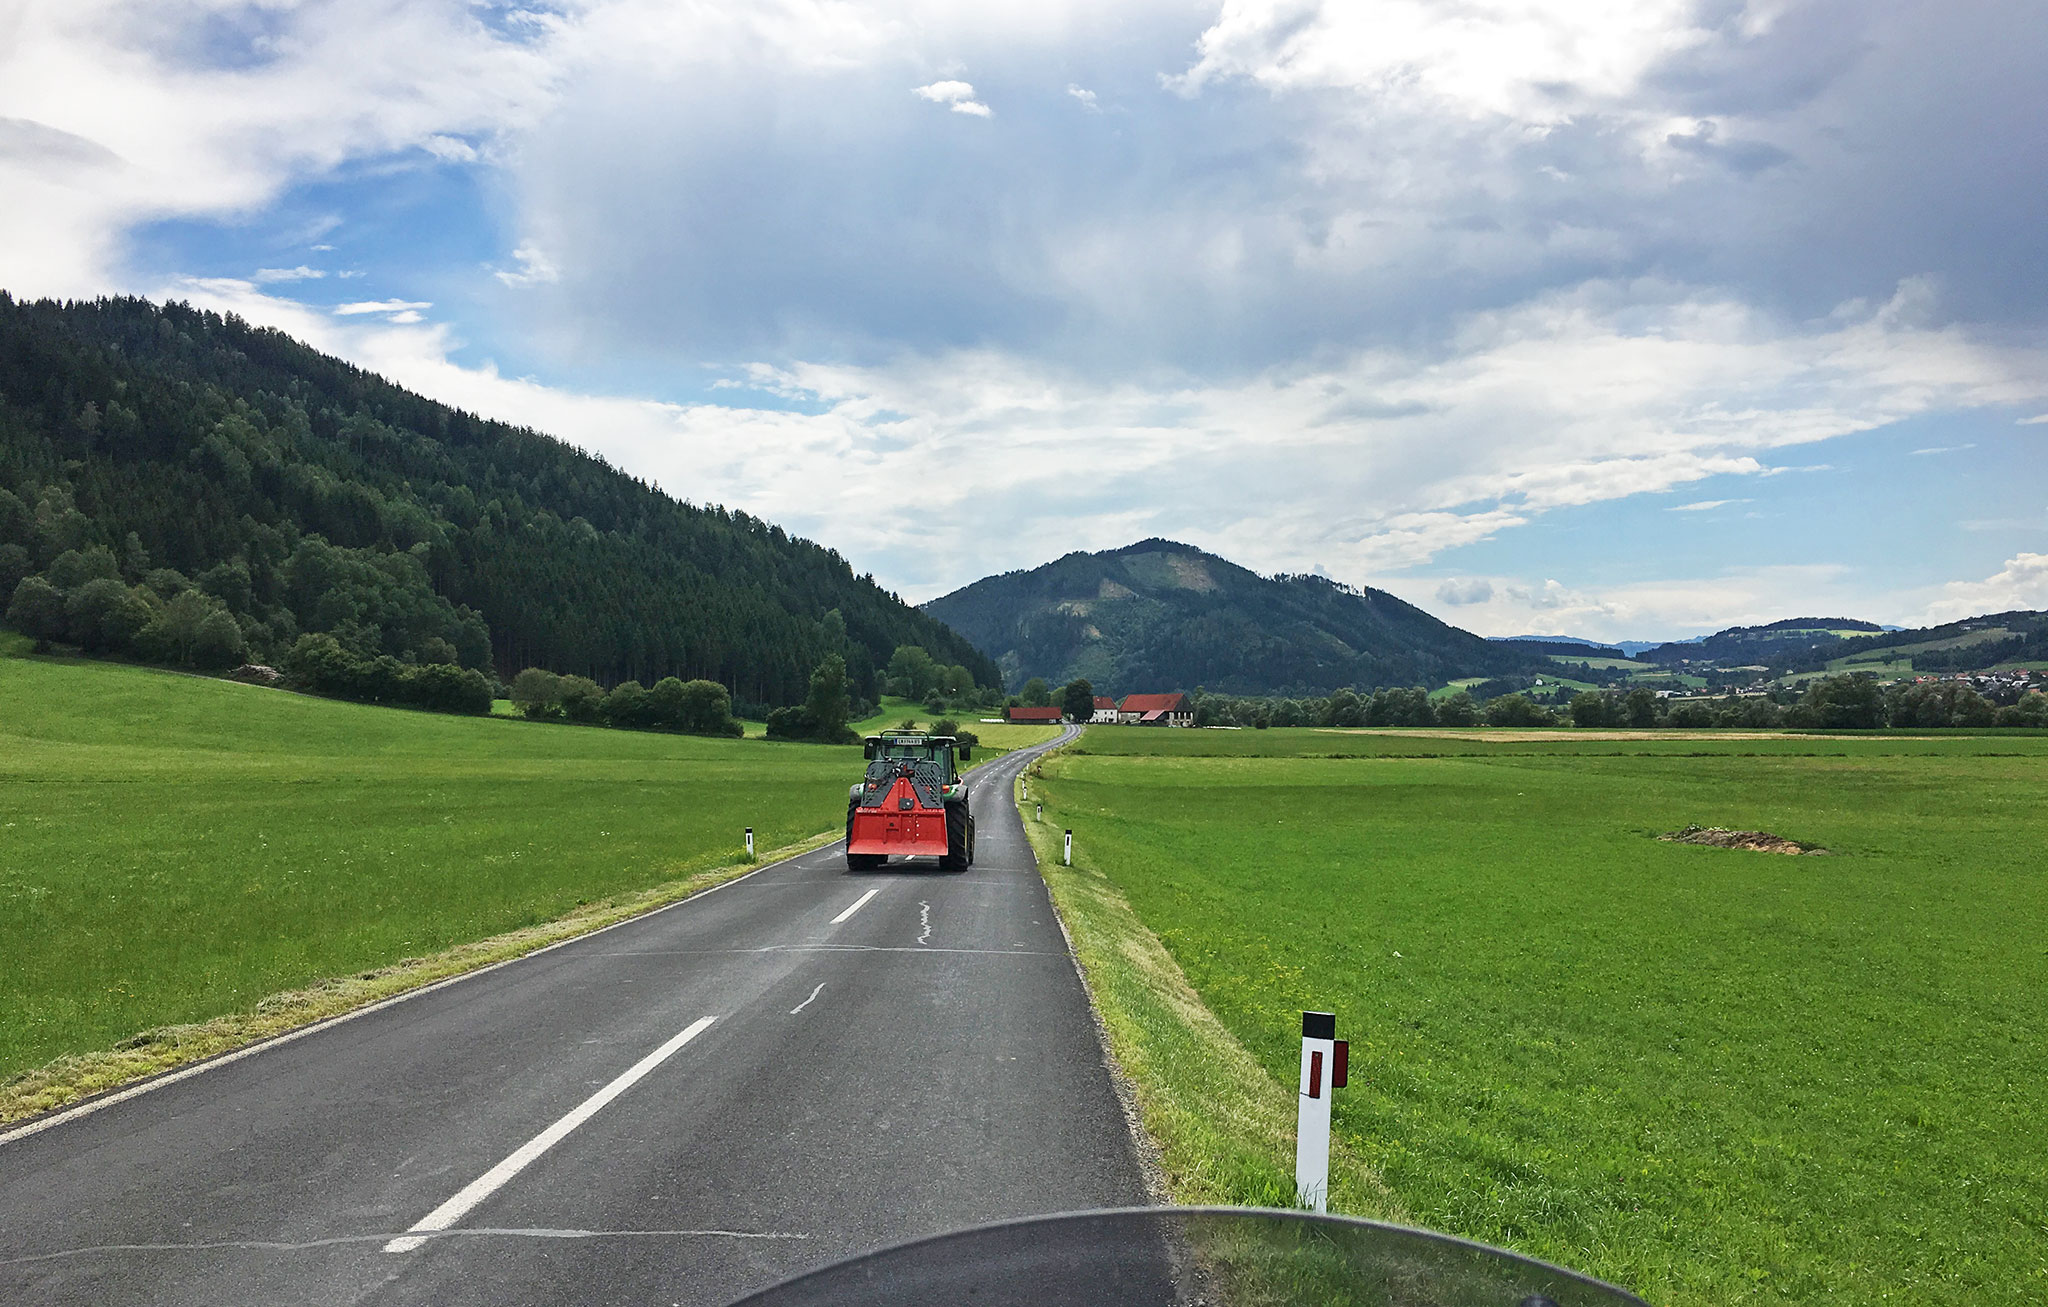 Smallways traffic in Austria